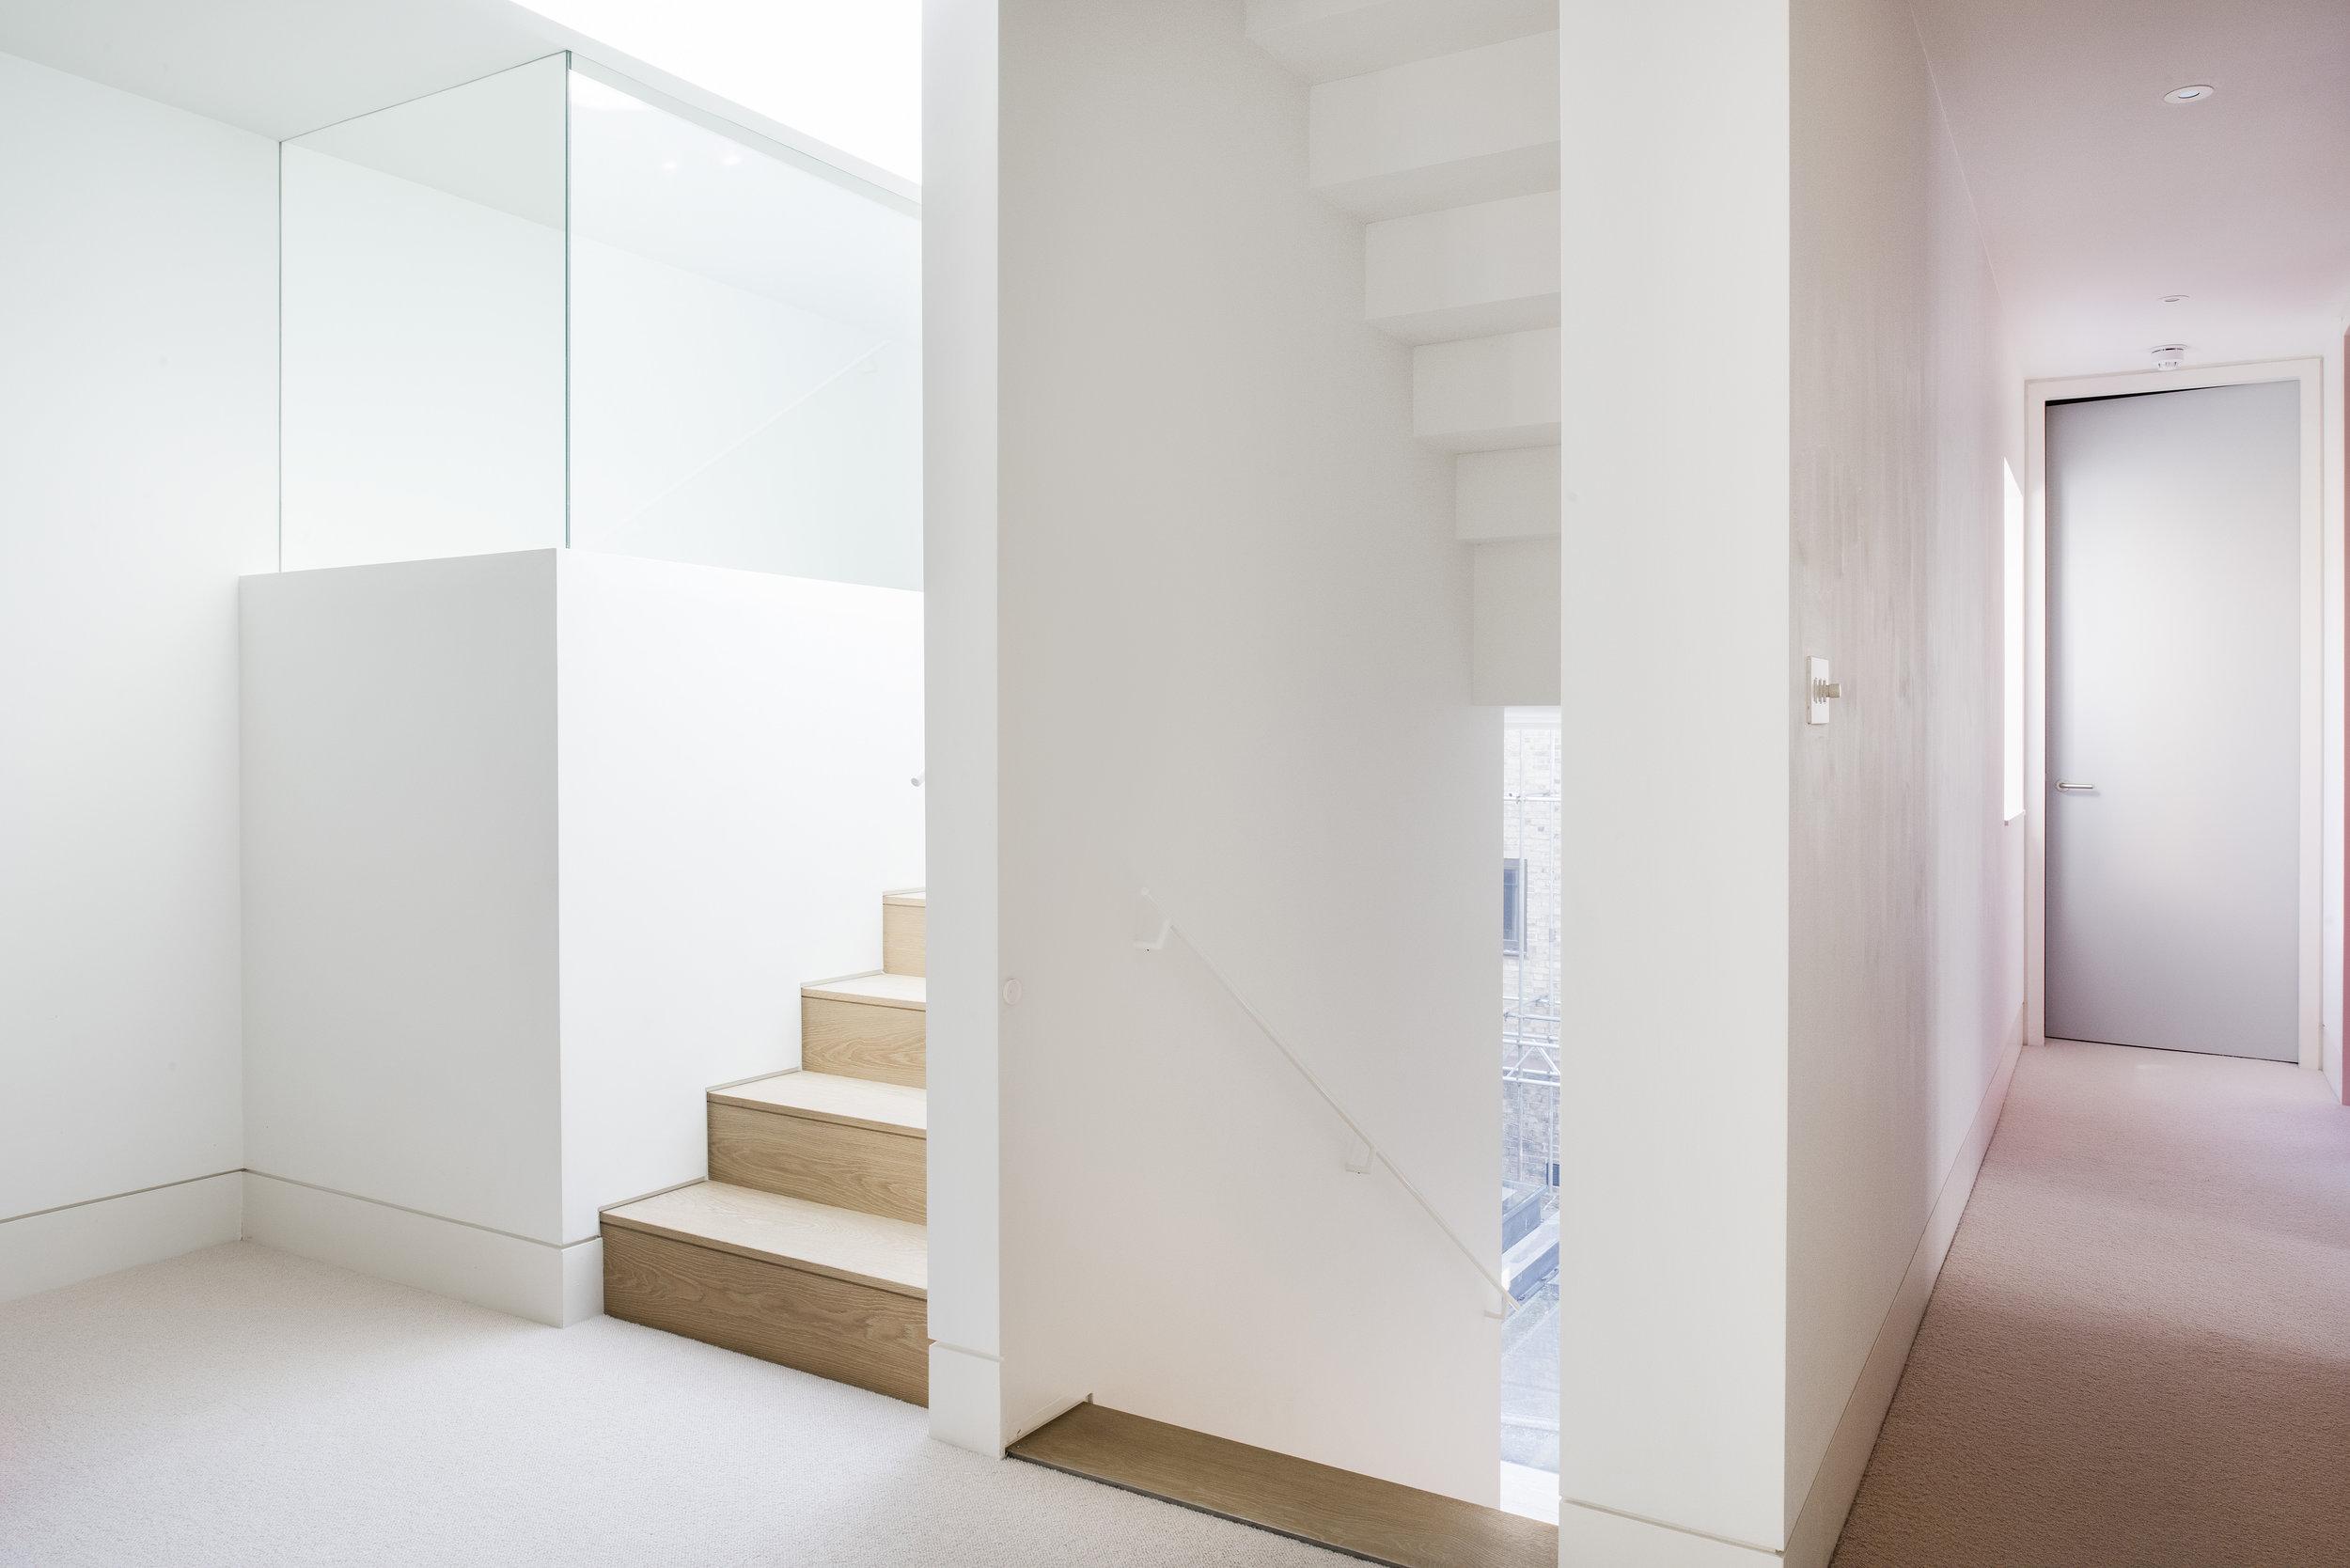 Chelsea-House-Jill-Tate-11.jpg